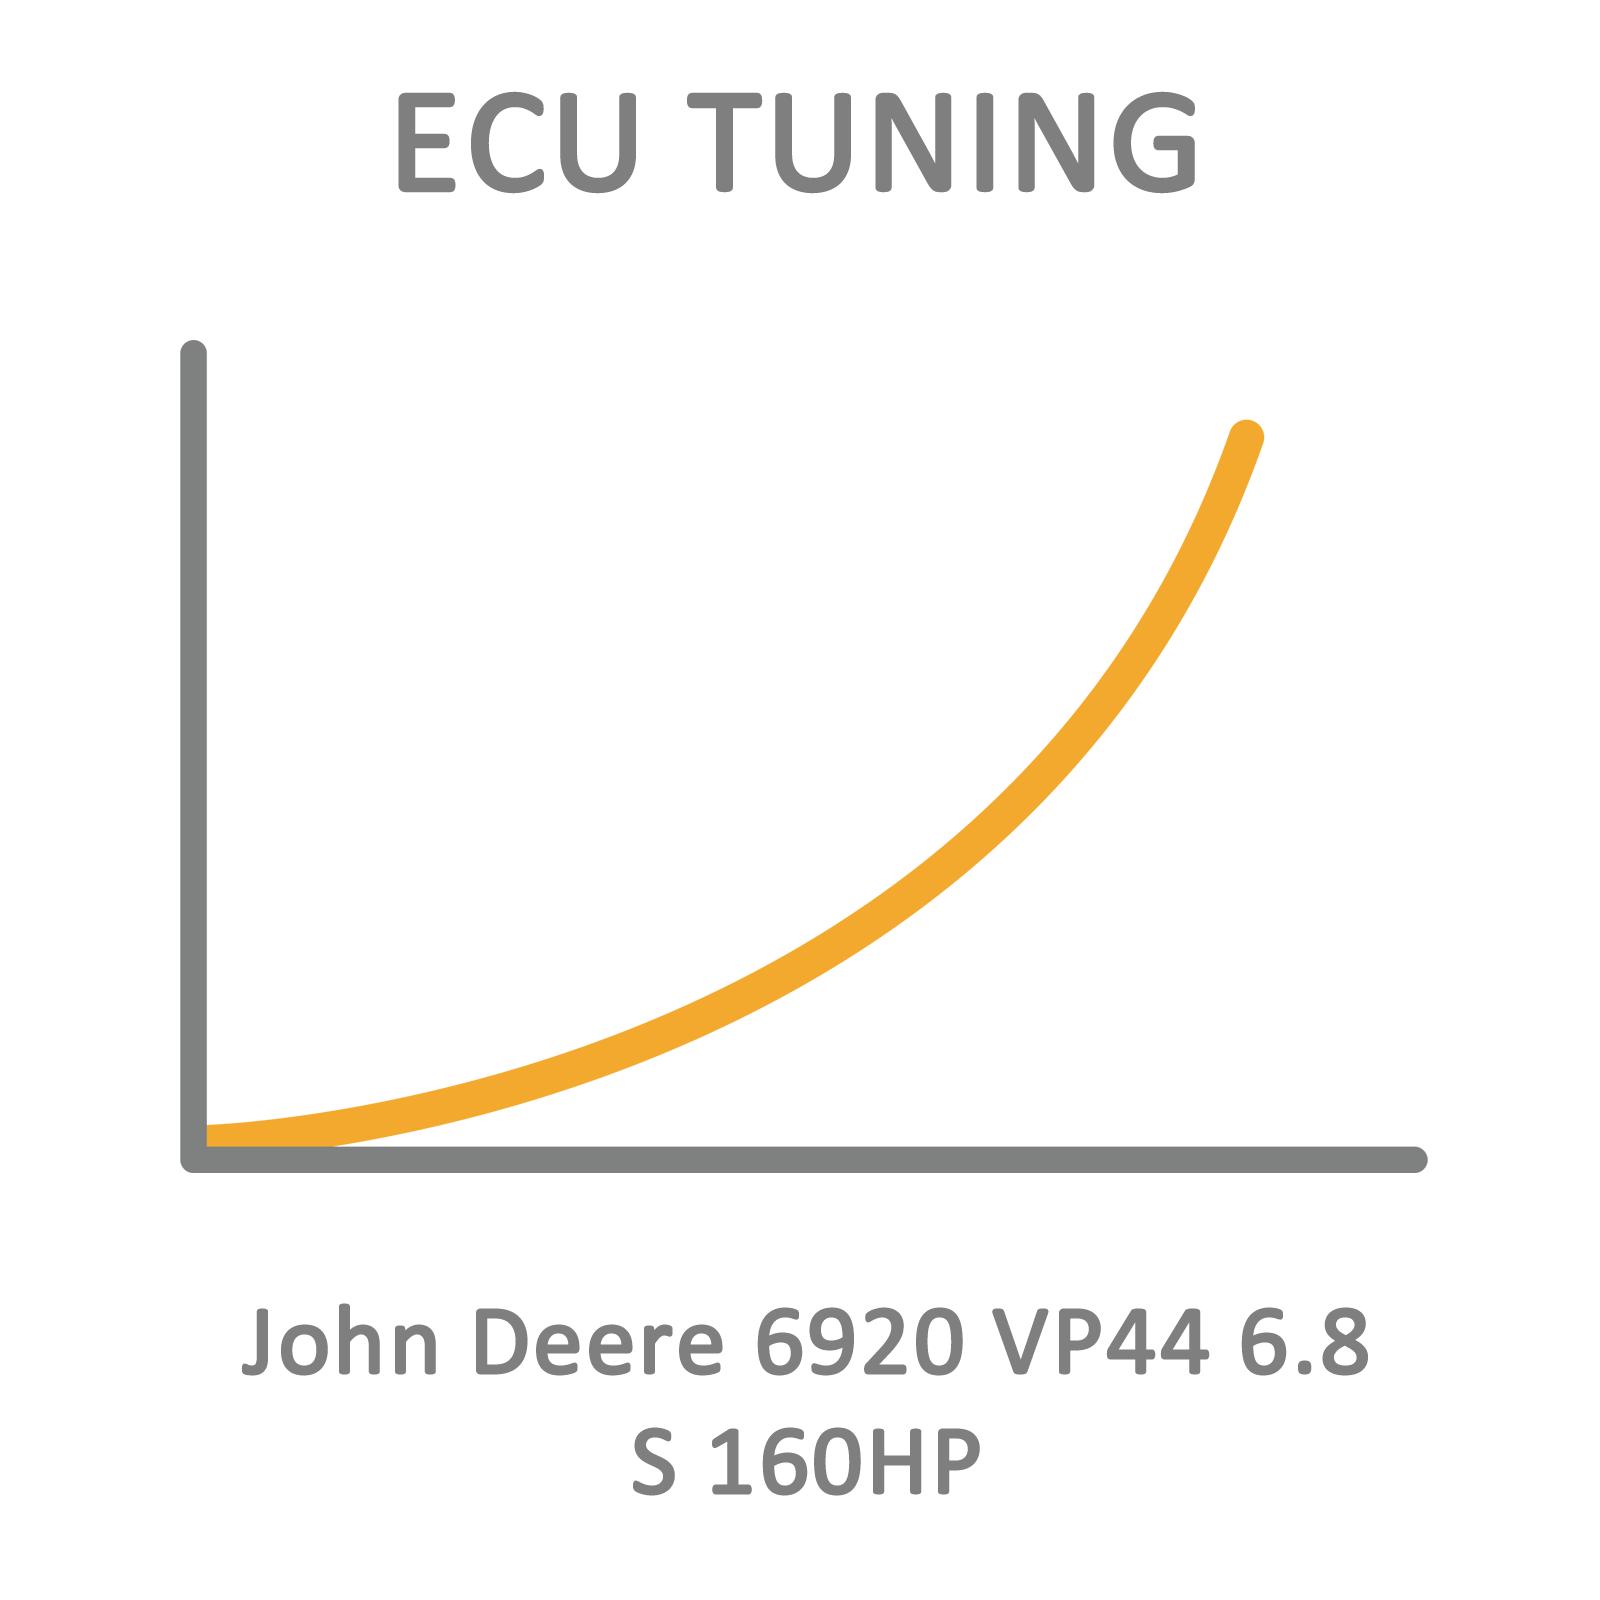 John Deere 6920 VP44 6.8 S 160HP ECU Tuning Remapping